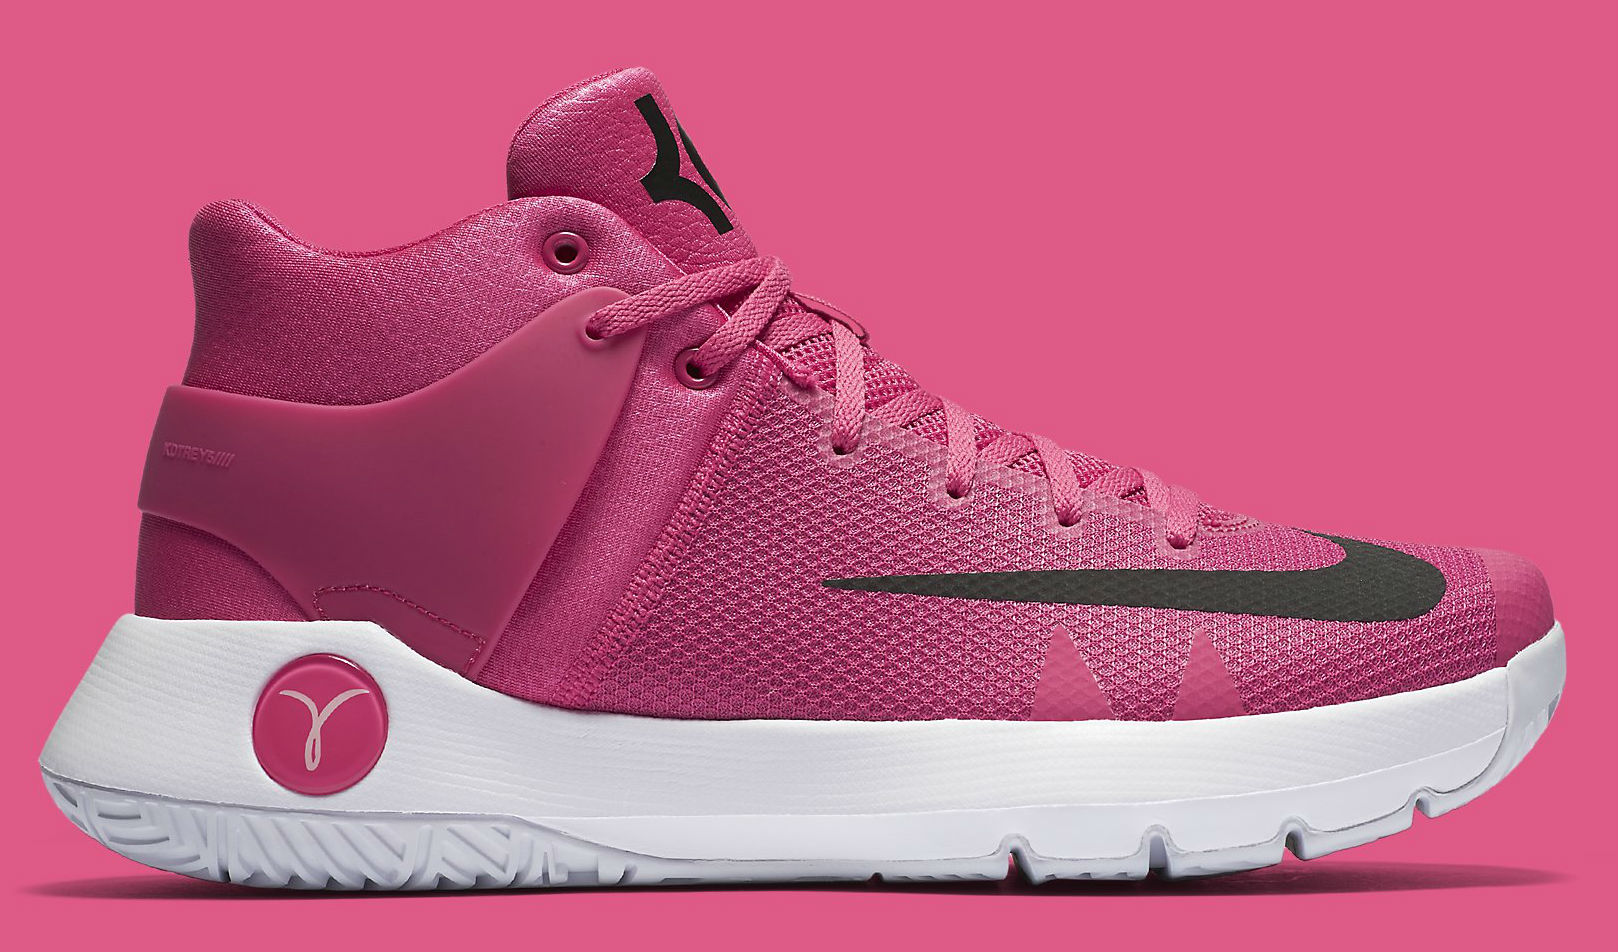 Kd Trey 5 Iv Pink Nike Kd Trey 5 Pink  1083215a43